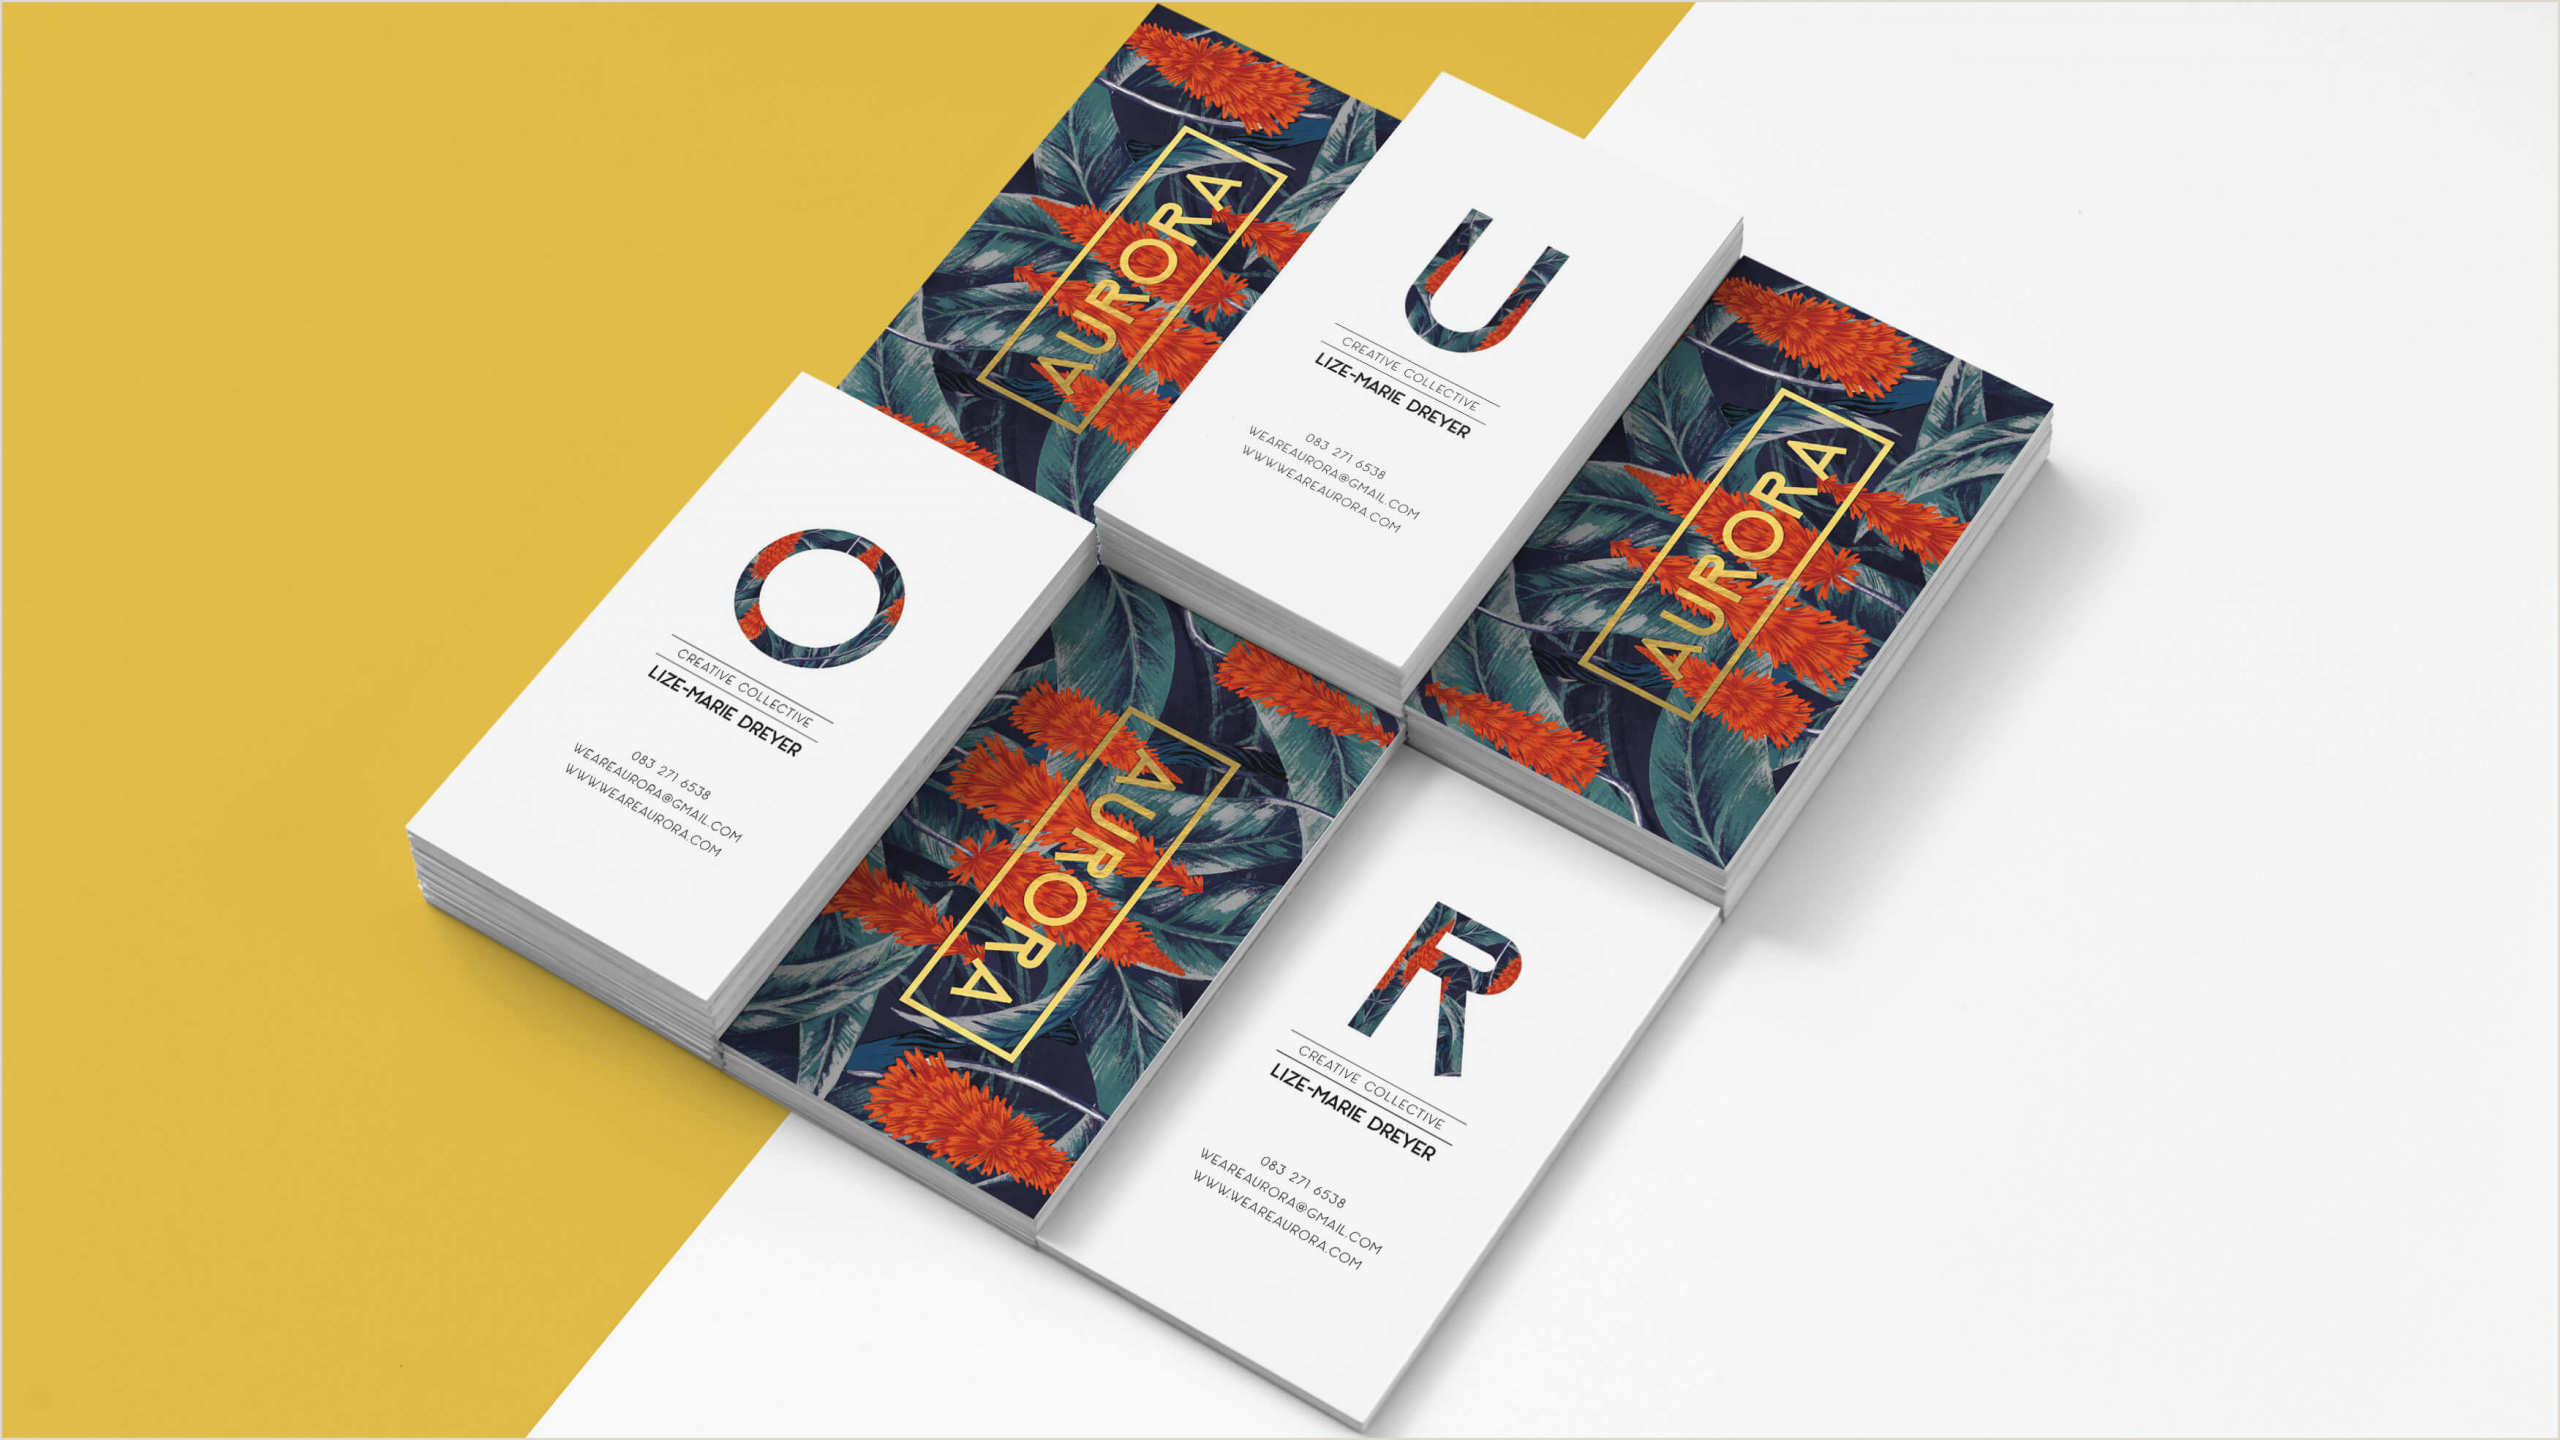 Design Agency Business Cards 8 Brilliant Design Agency Business Cards